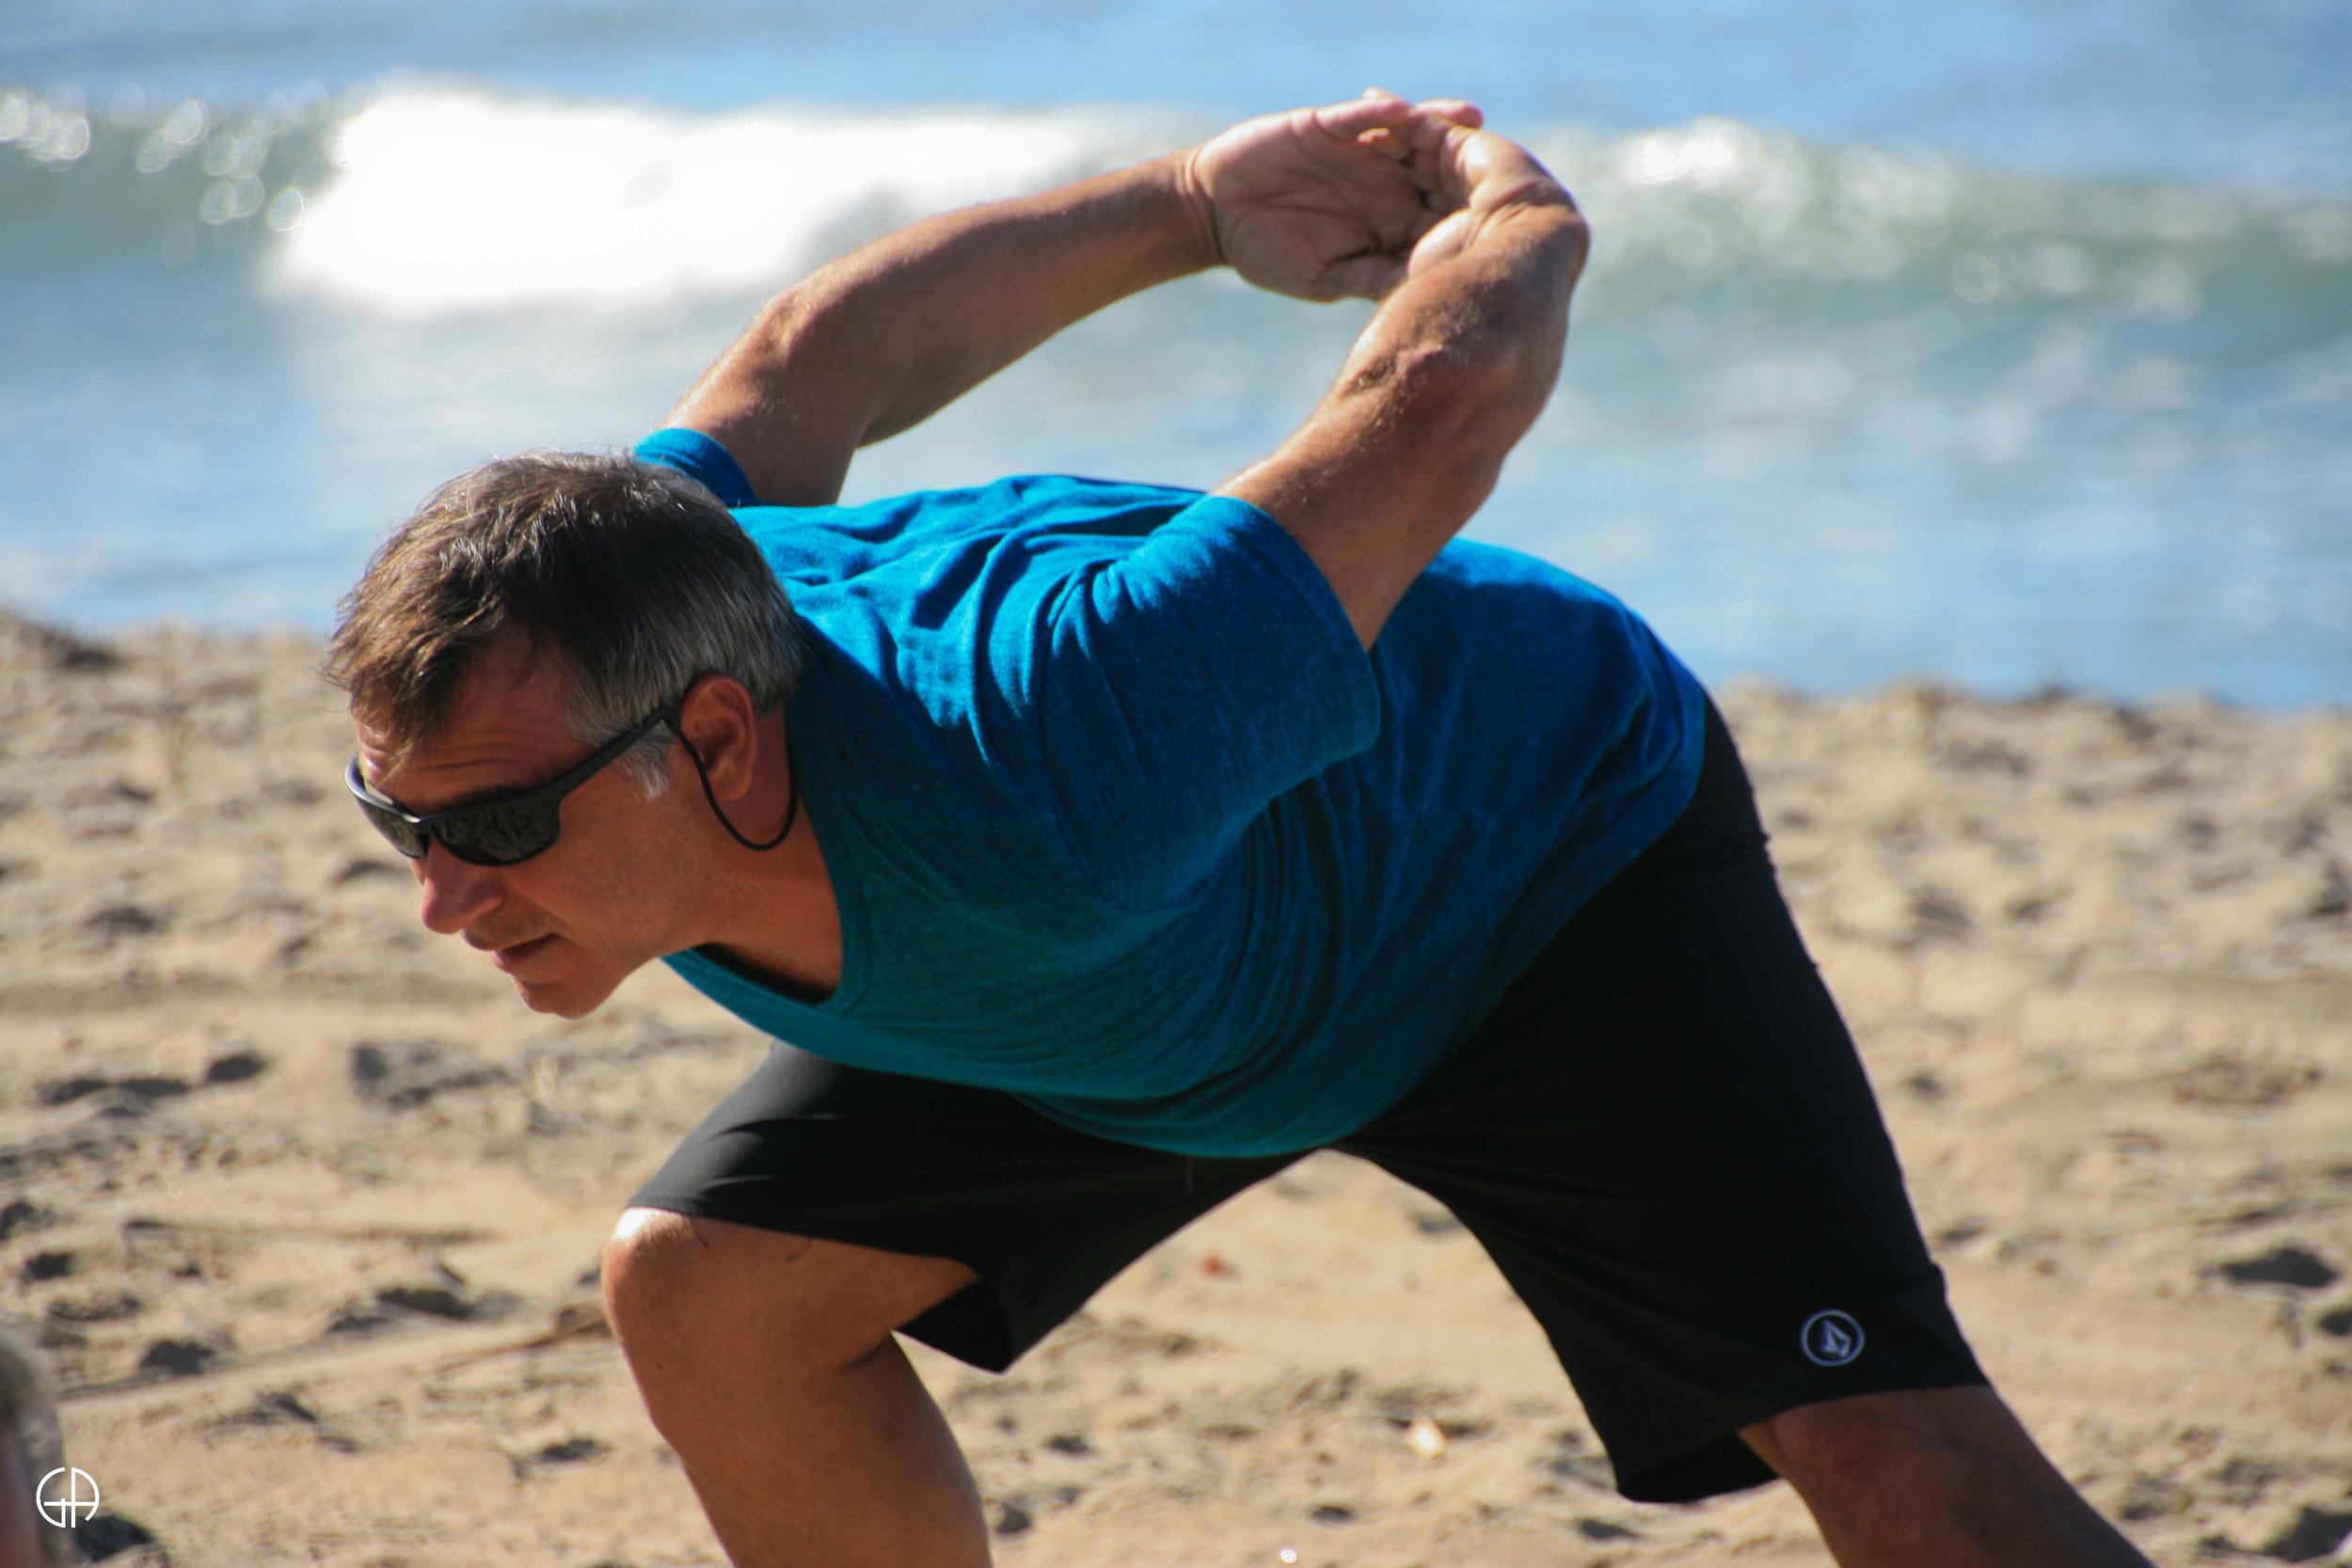 yoga for surfer bobby johnson from Santa Rosa BEach, FLorida